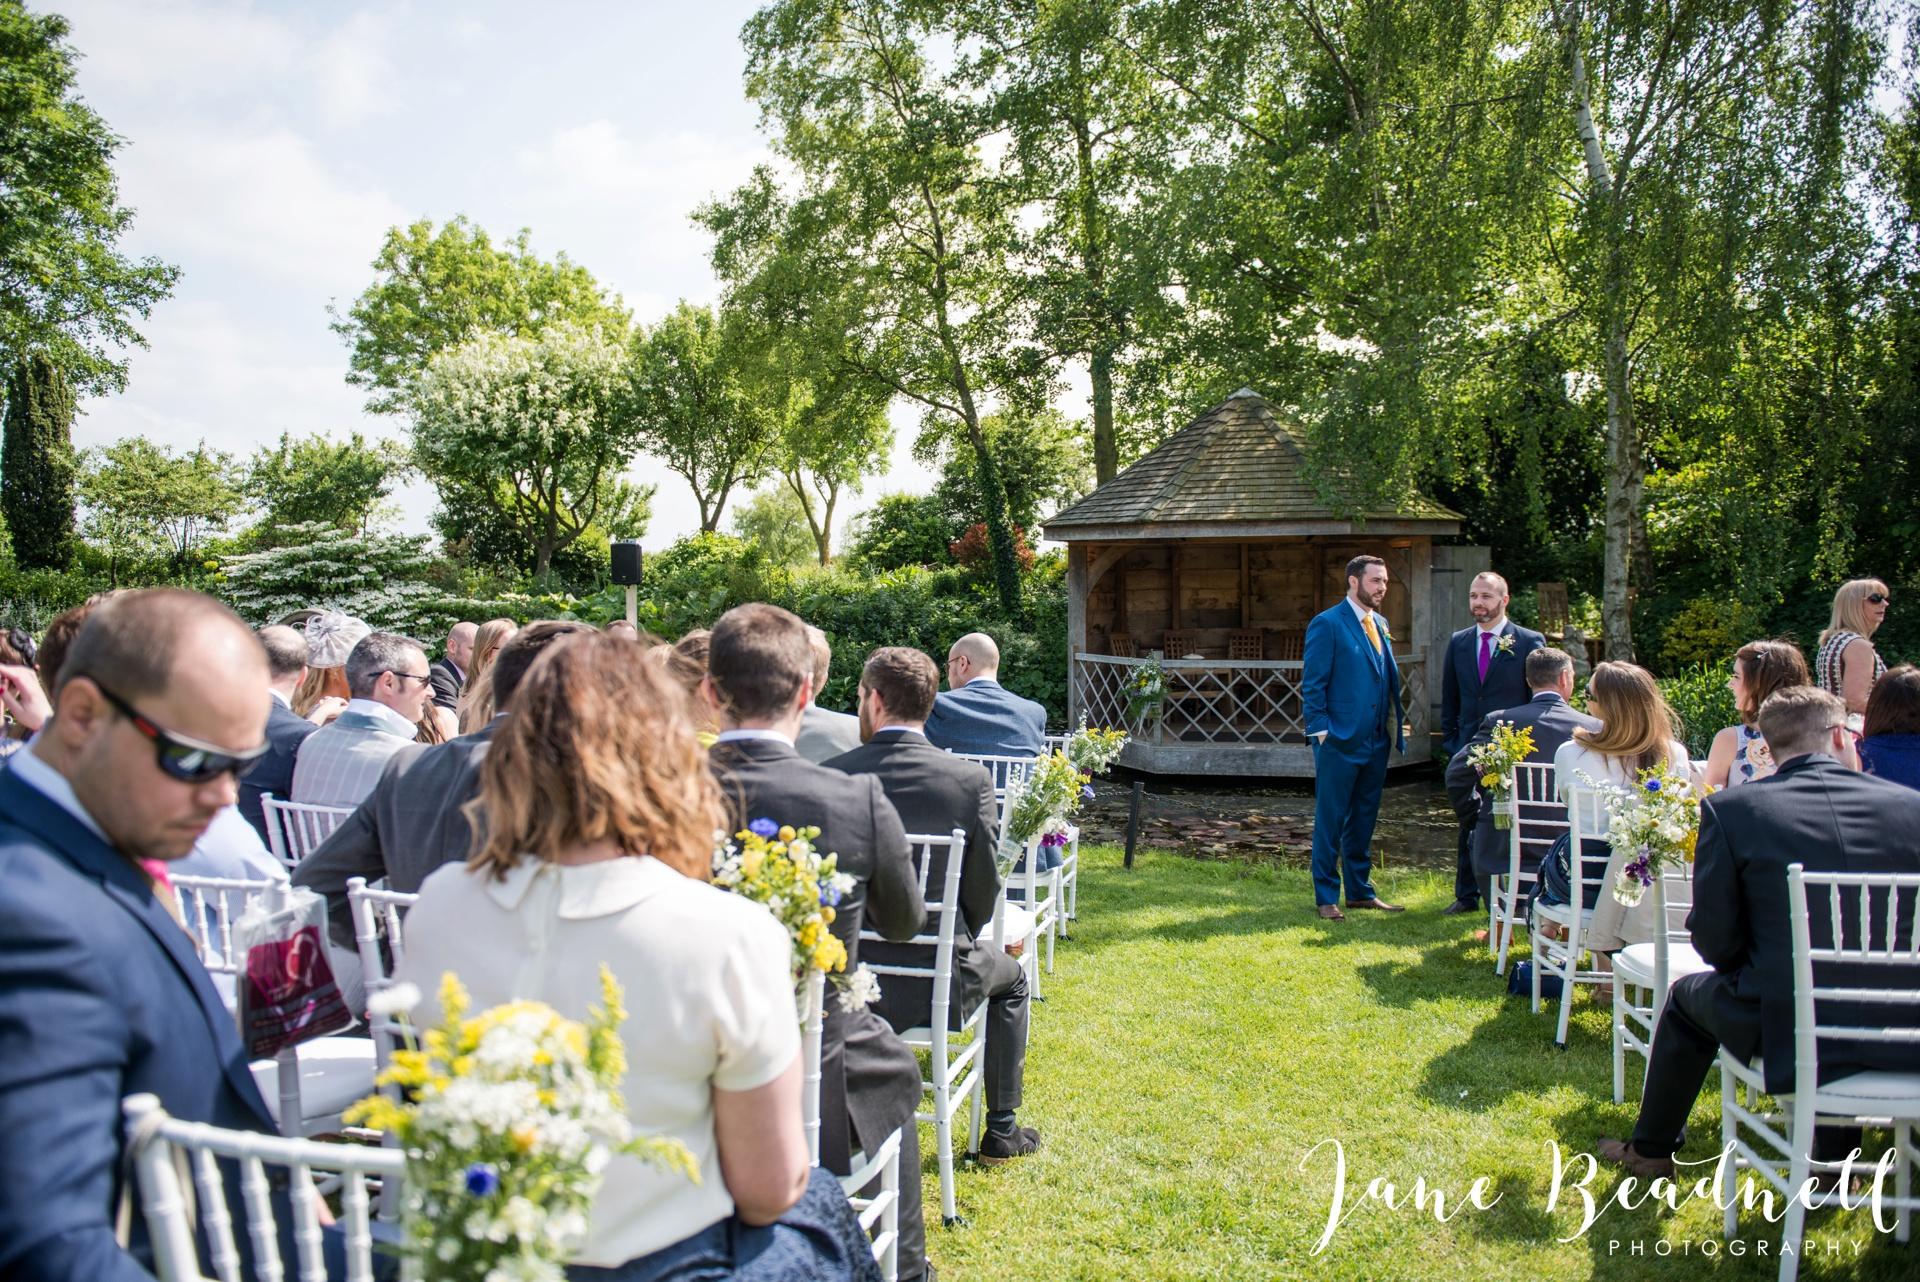 South Farm Wedding photography Hertfordshire by Jane Beadnell Photography fine art wedding photographer_0049